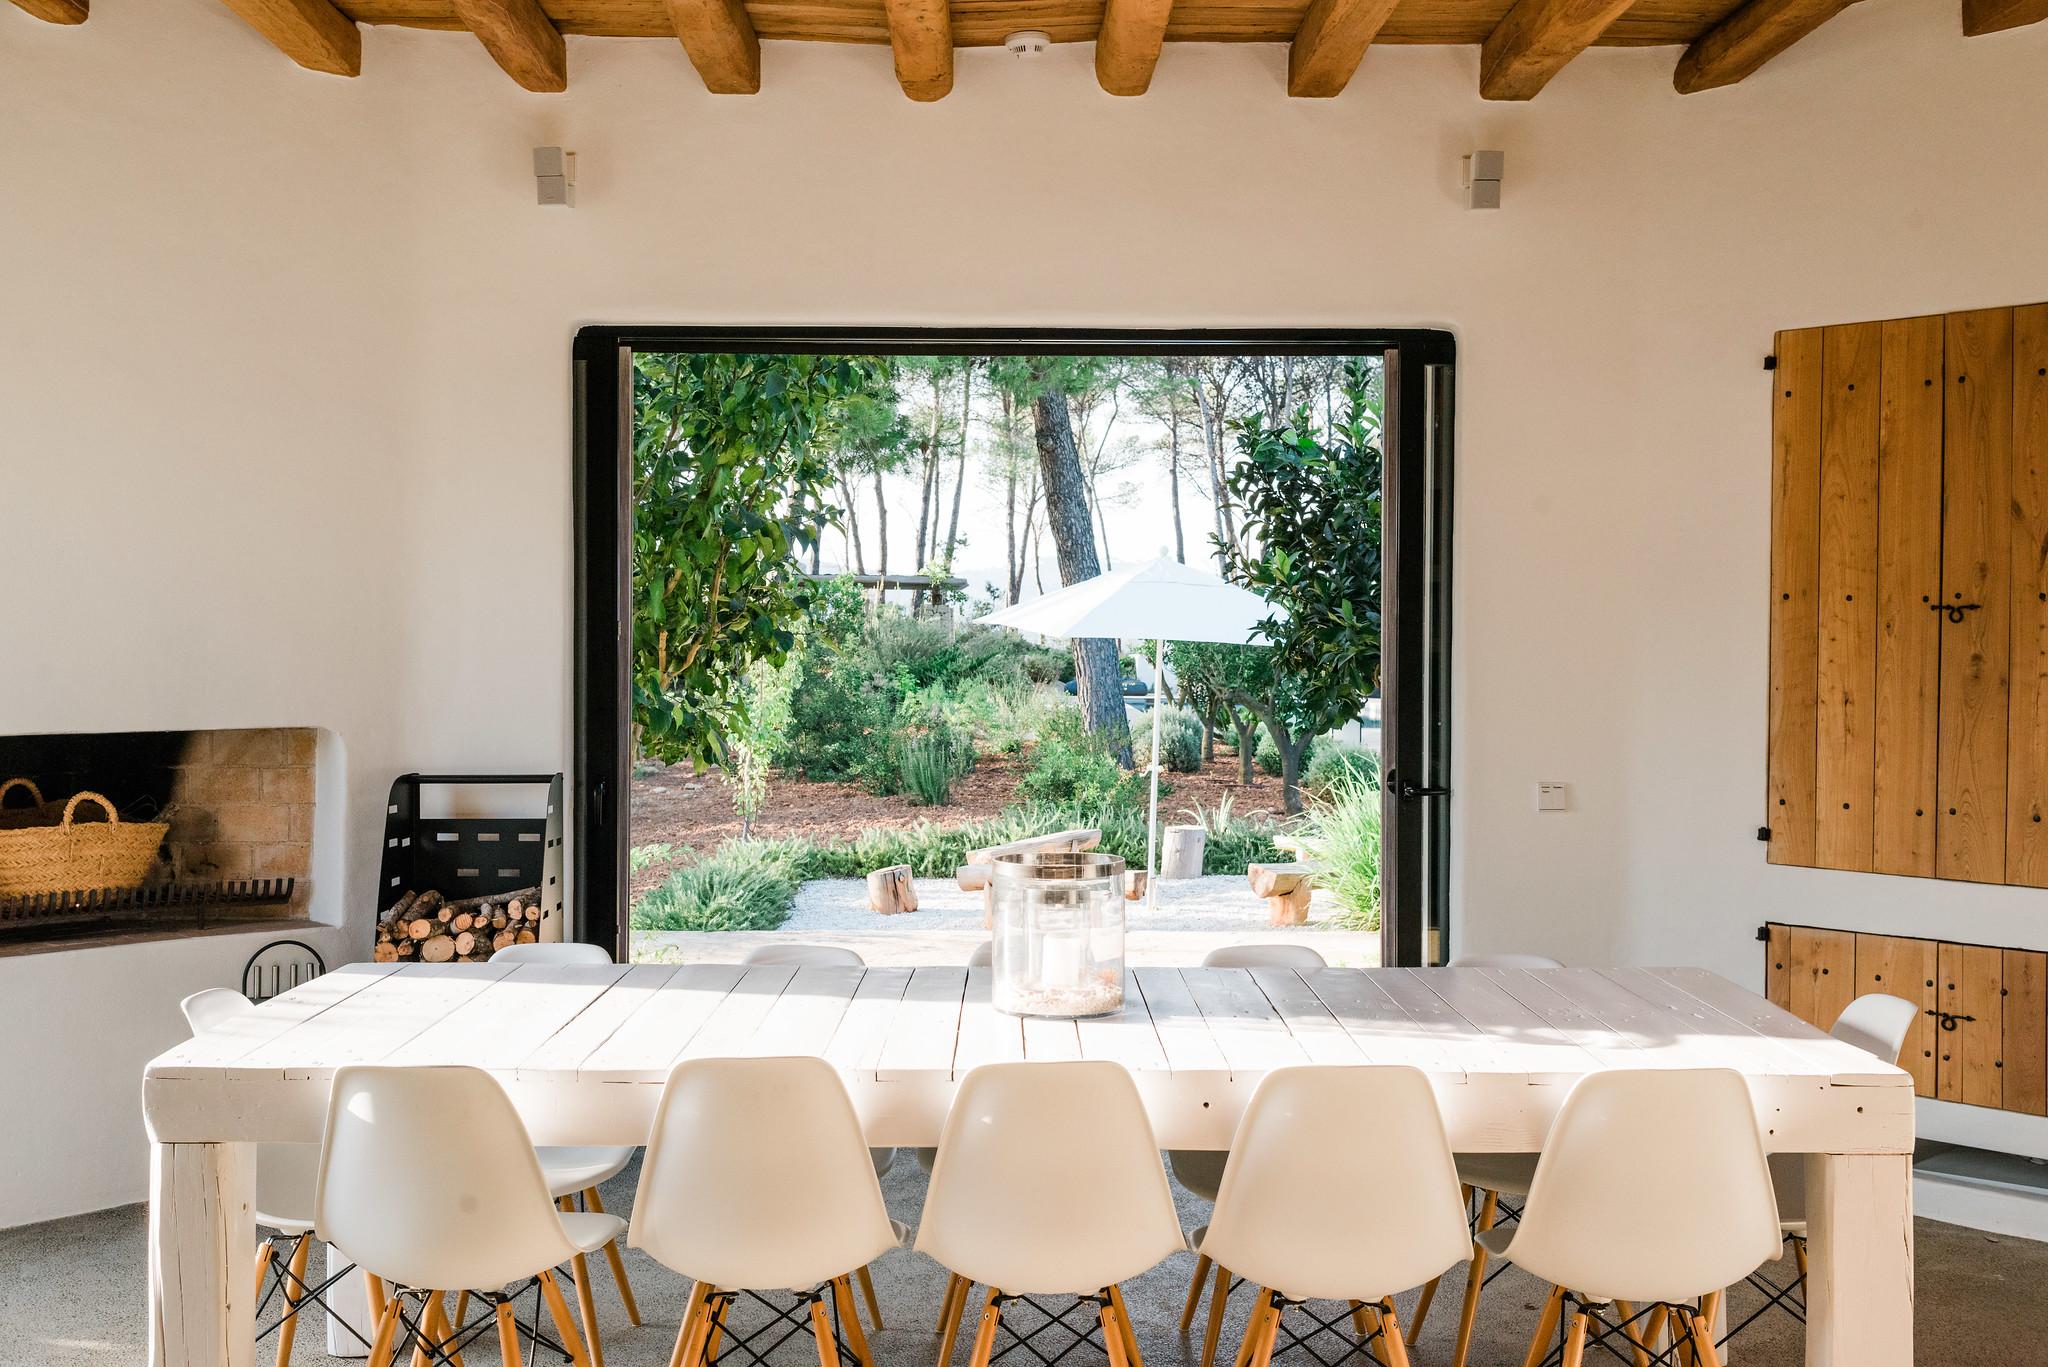 https://www.white-ibiza.com/wp-content/uploads/2020/05/white-ibiza-villas-can-terra-breakfast-table.jpg